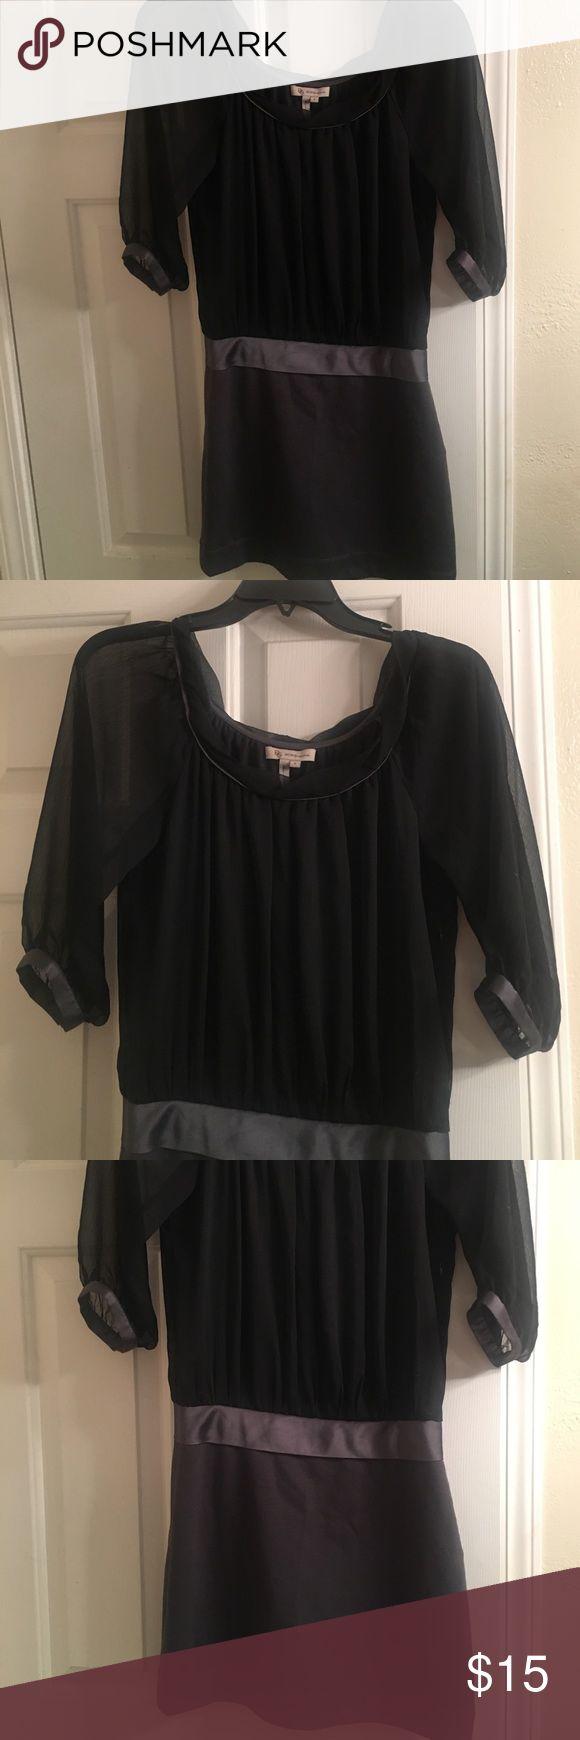 Sexy BCBG mini dress black and grey One piece top and skirt BCBG dress. Super cute, sheer sleeves. BCBGeneration Dresses Mini